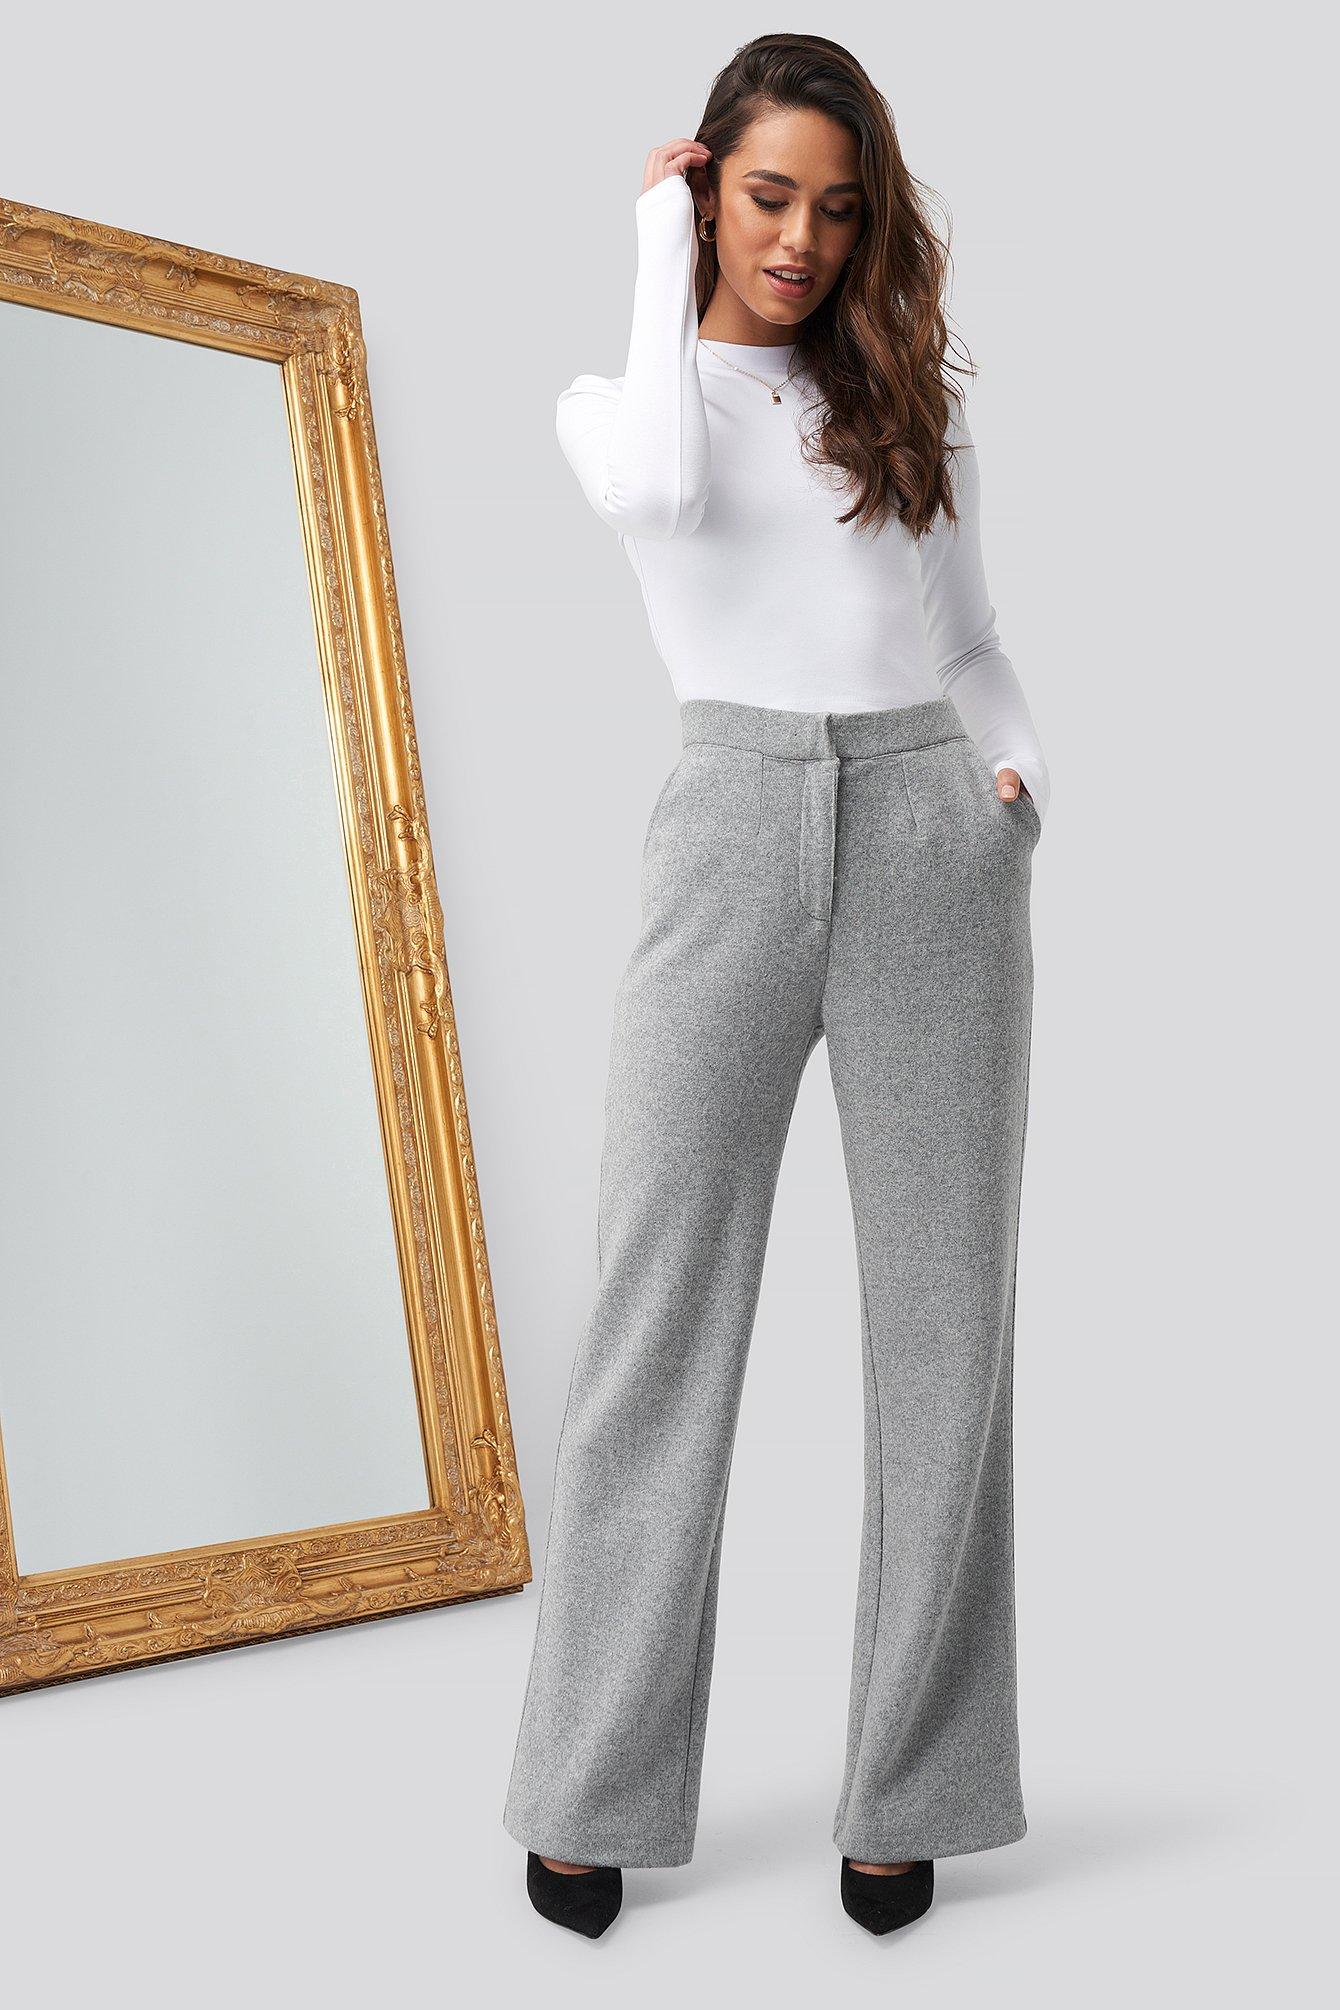 romy x na-kd -  Flare Leg Pants - Grey